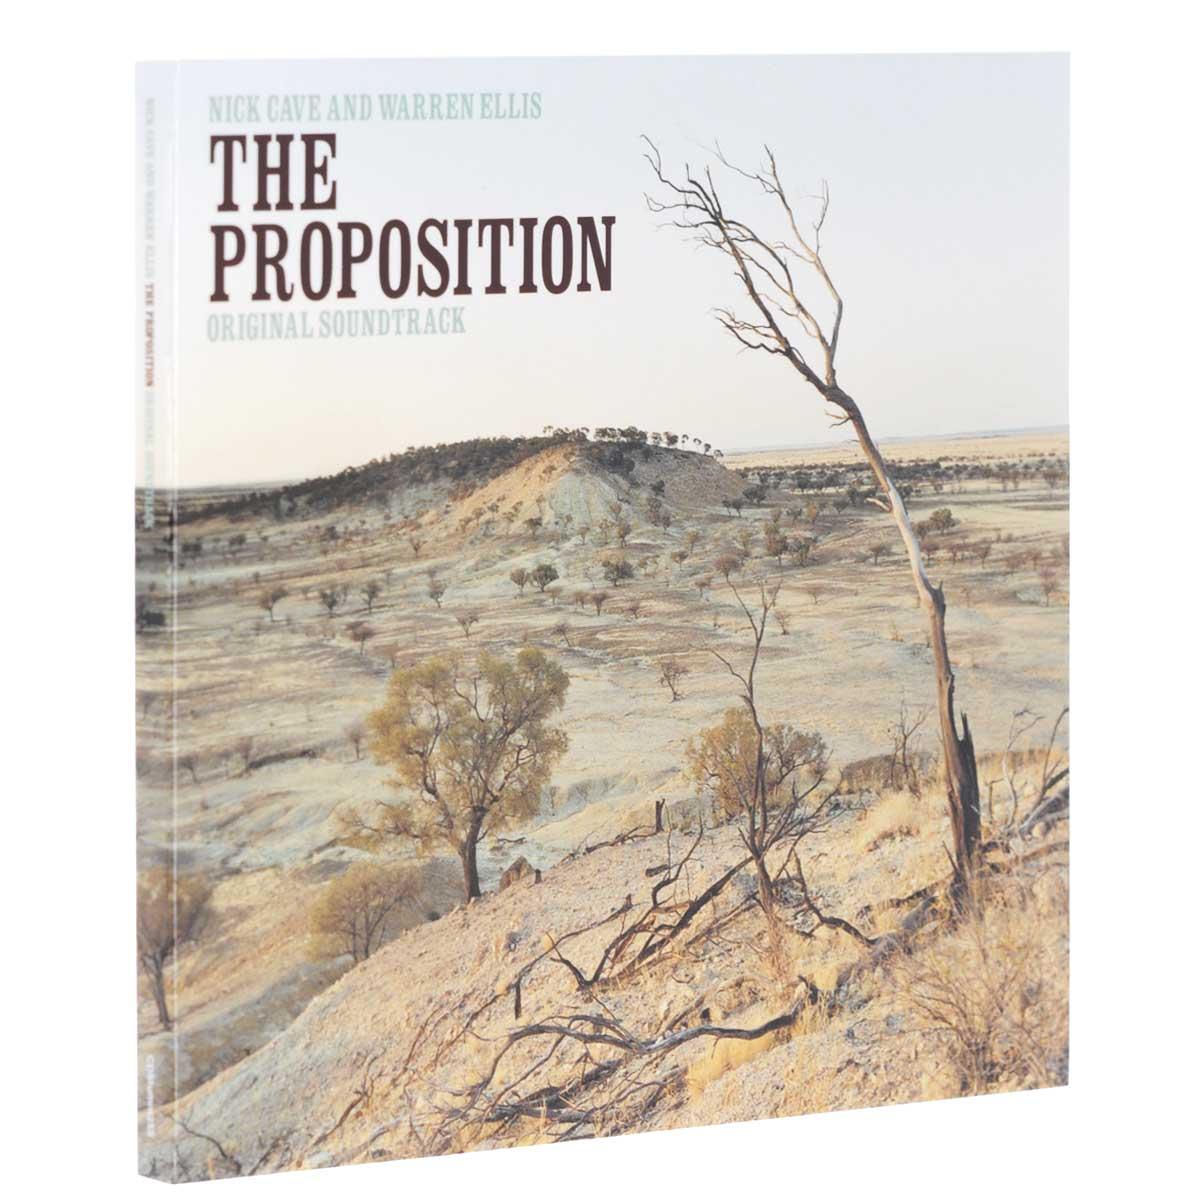 Nick Cave And Warren Ellis. The Proposition. Original Soundtrack confessions of a shopaholic original soundtrack